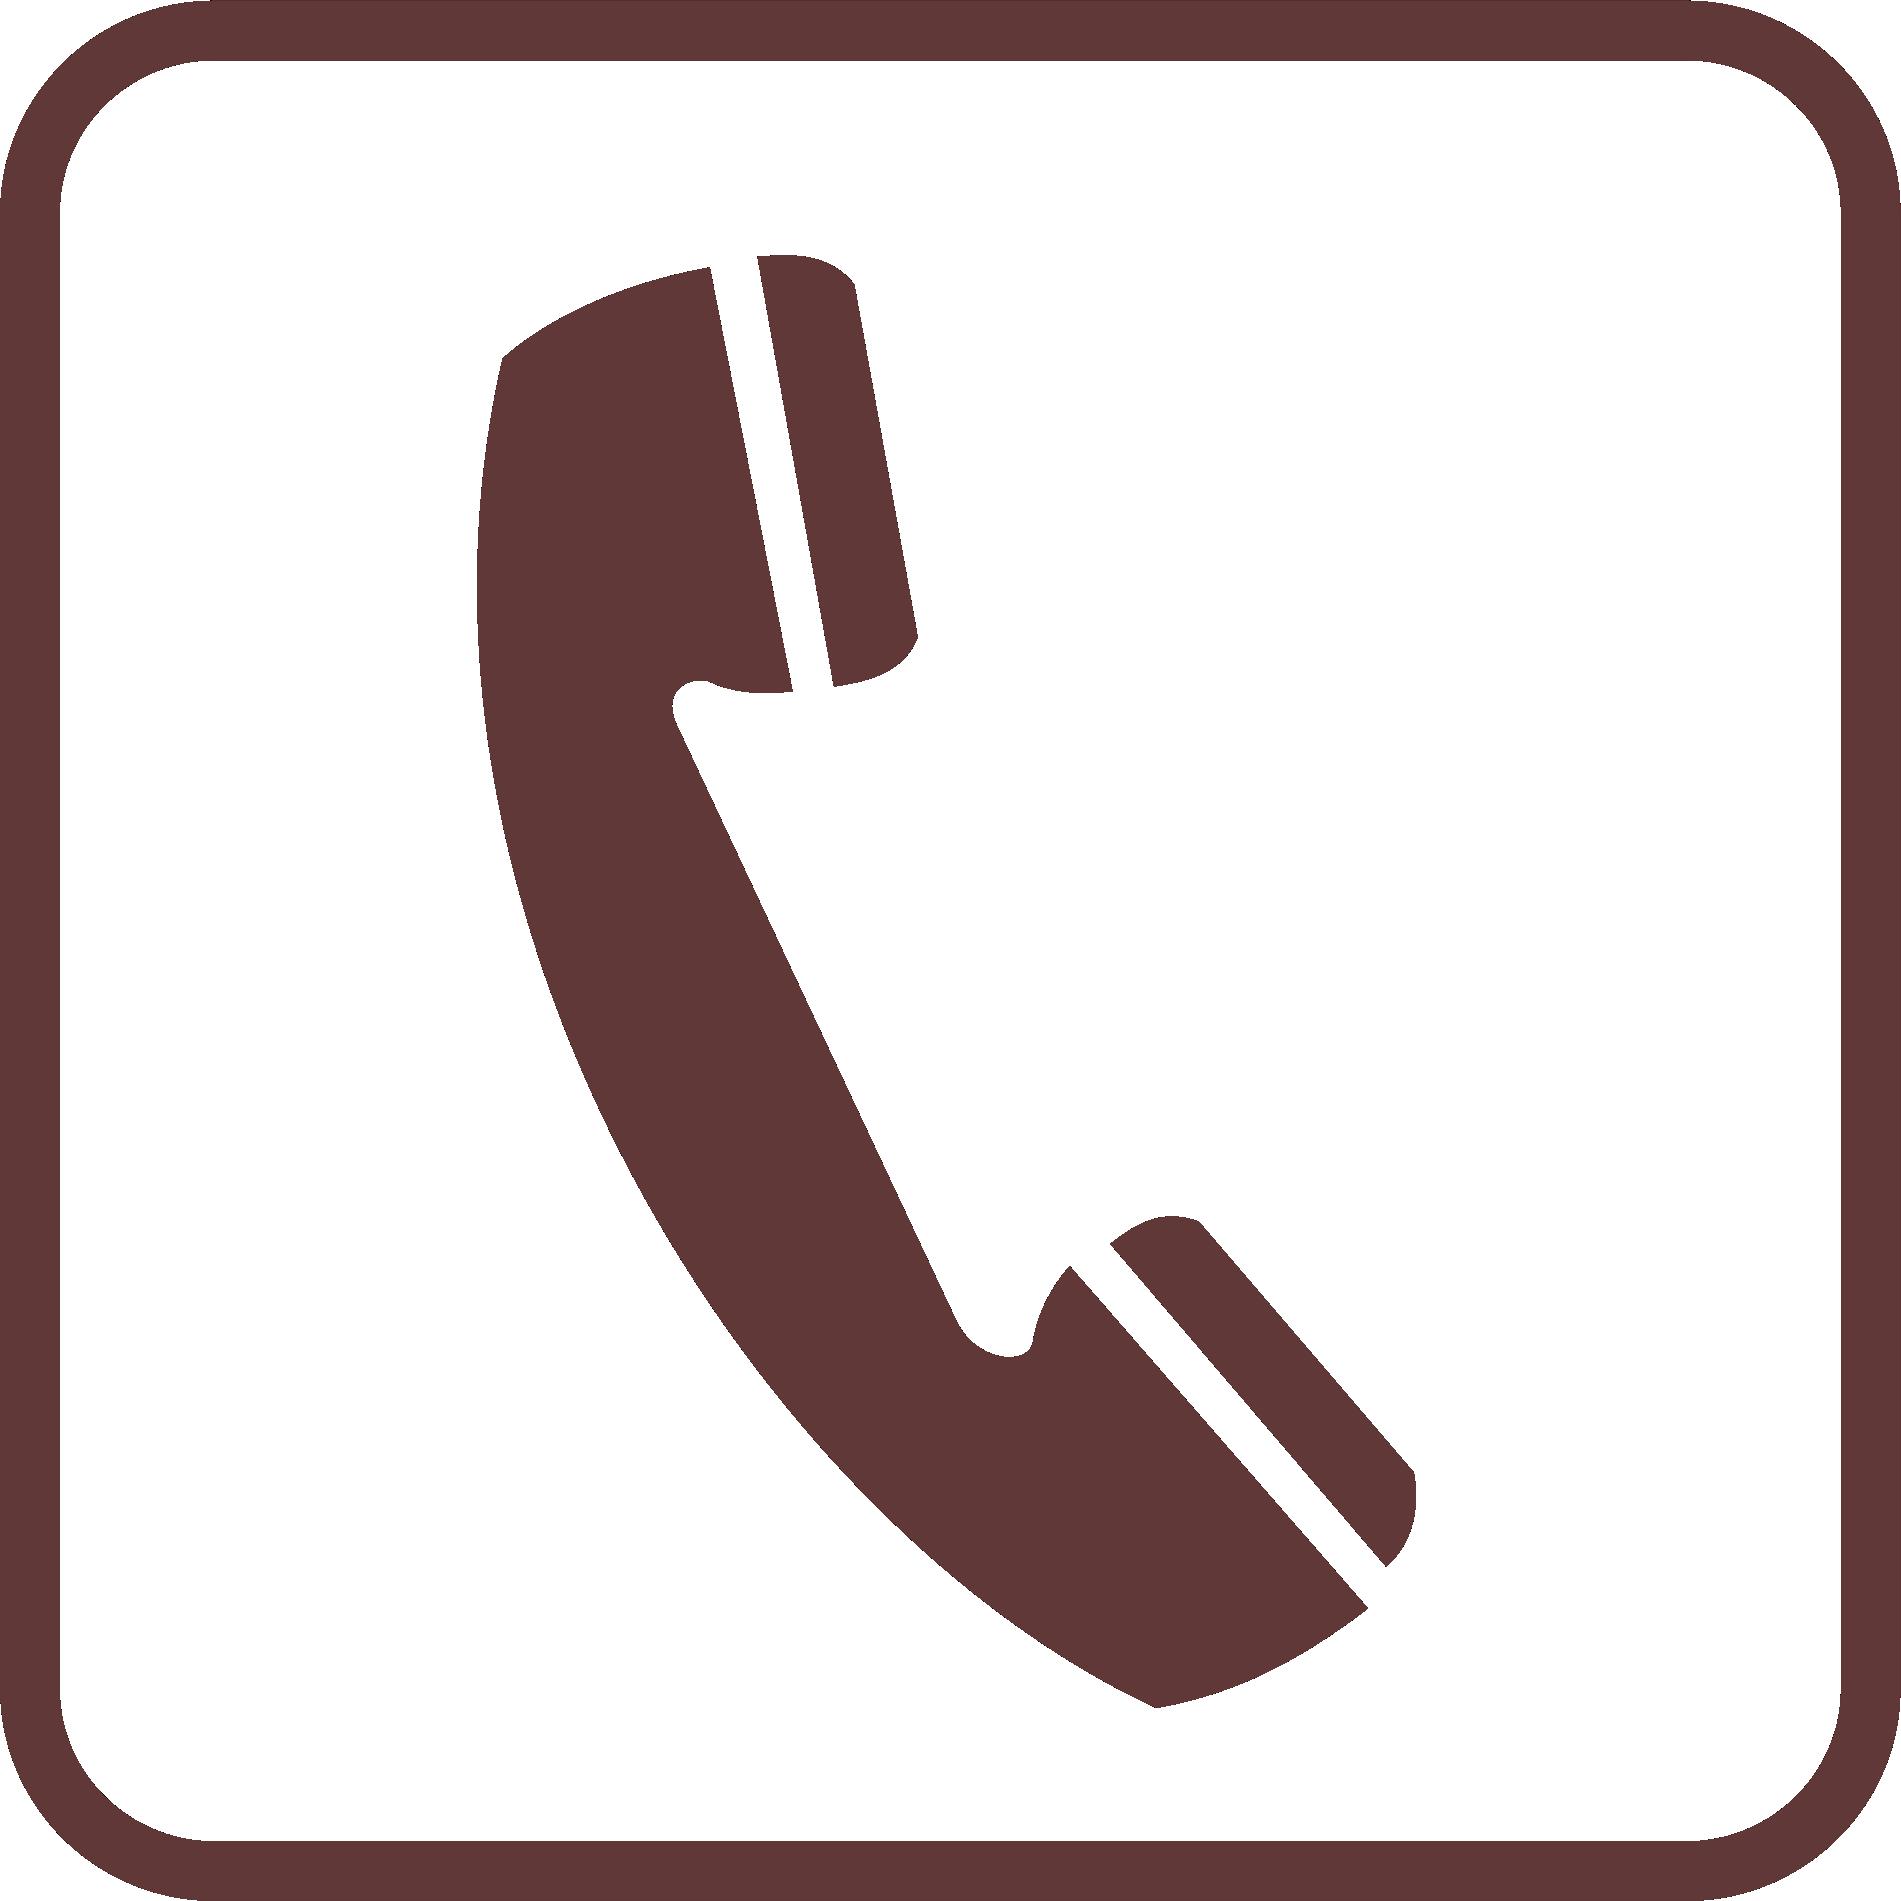 Bus logo payphone icon. Telephone clipart telephone symbol